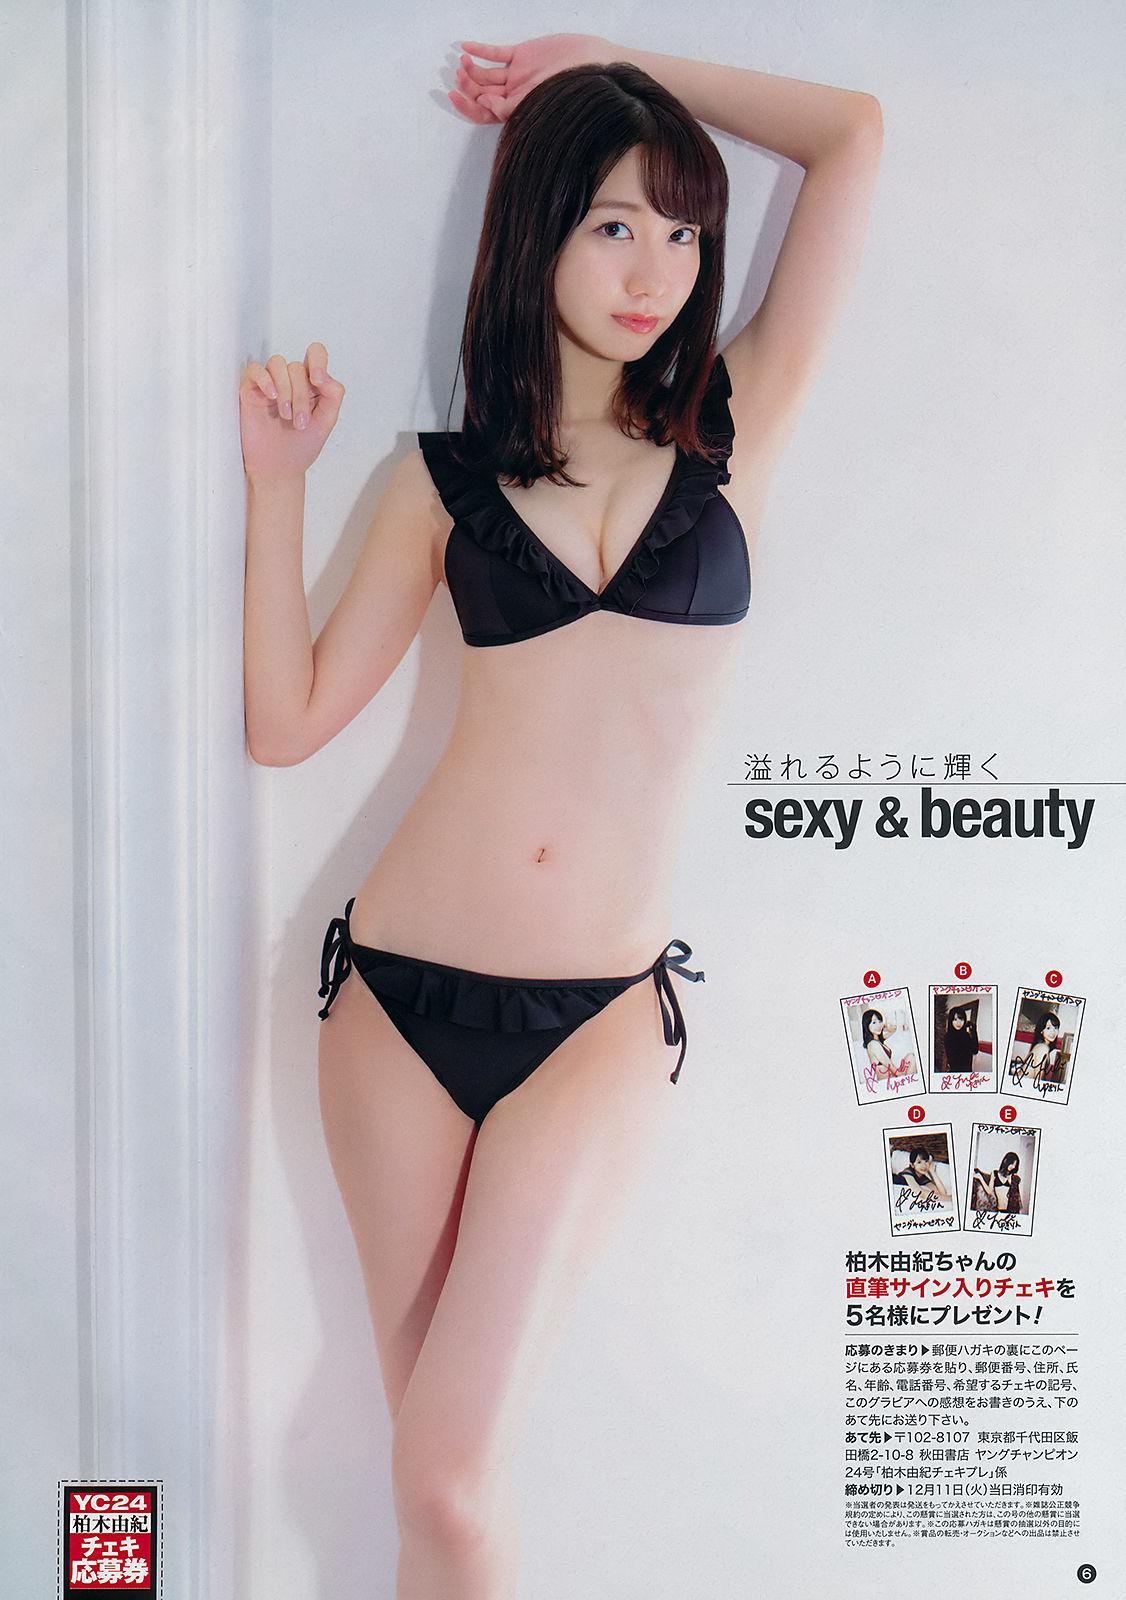 VOL.68 [Young Champion]日本萌妹子:柏木由纪(柏木由紀)超高清写真套图(13P)